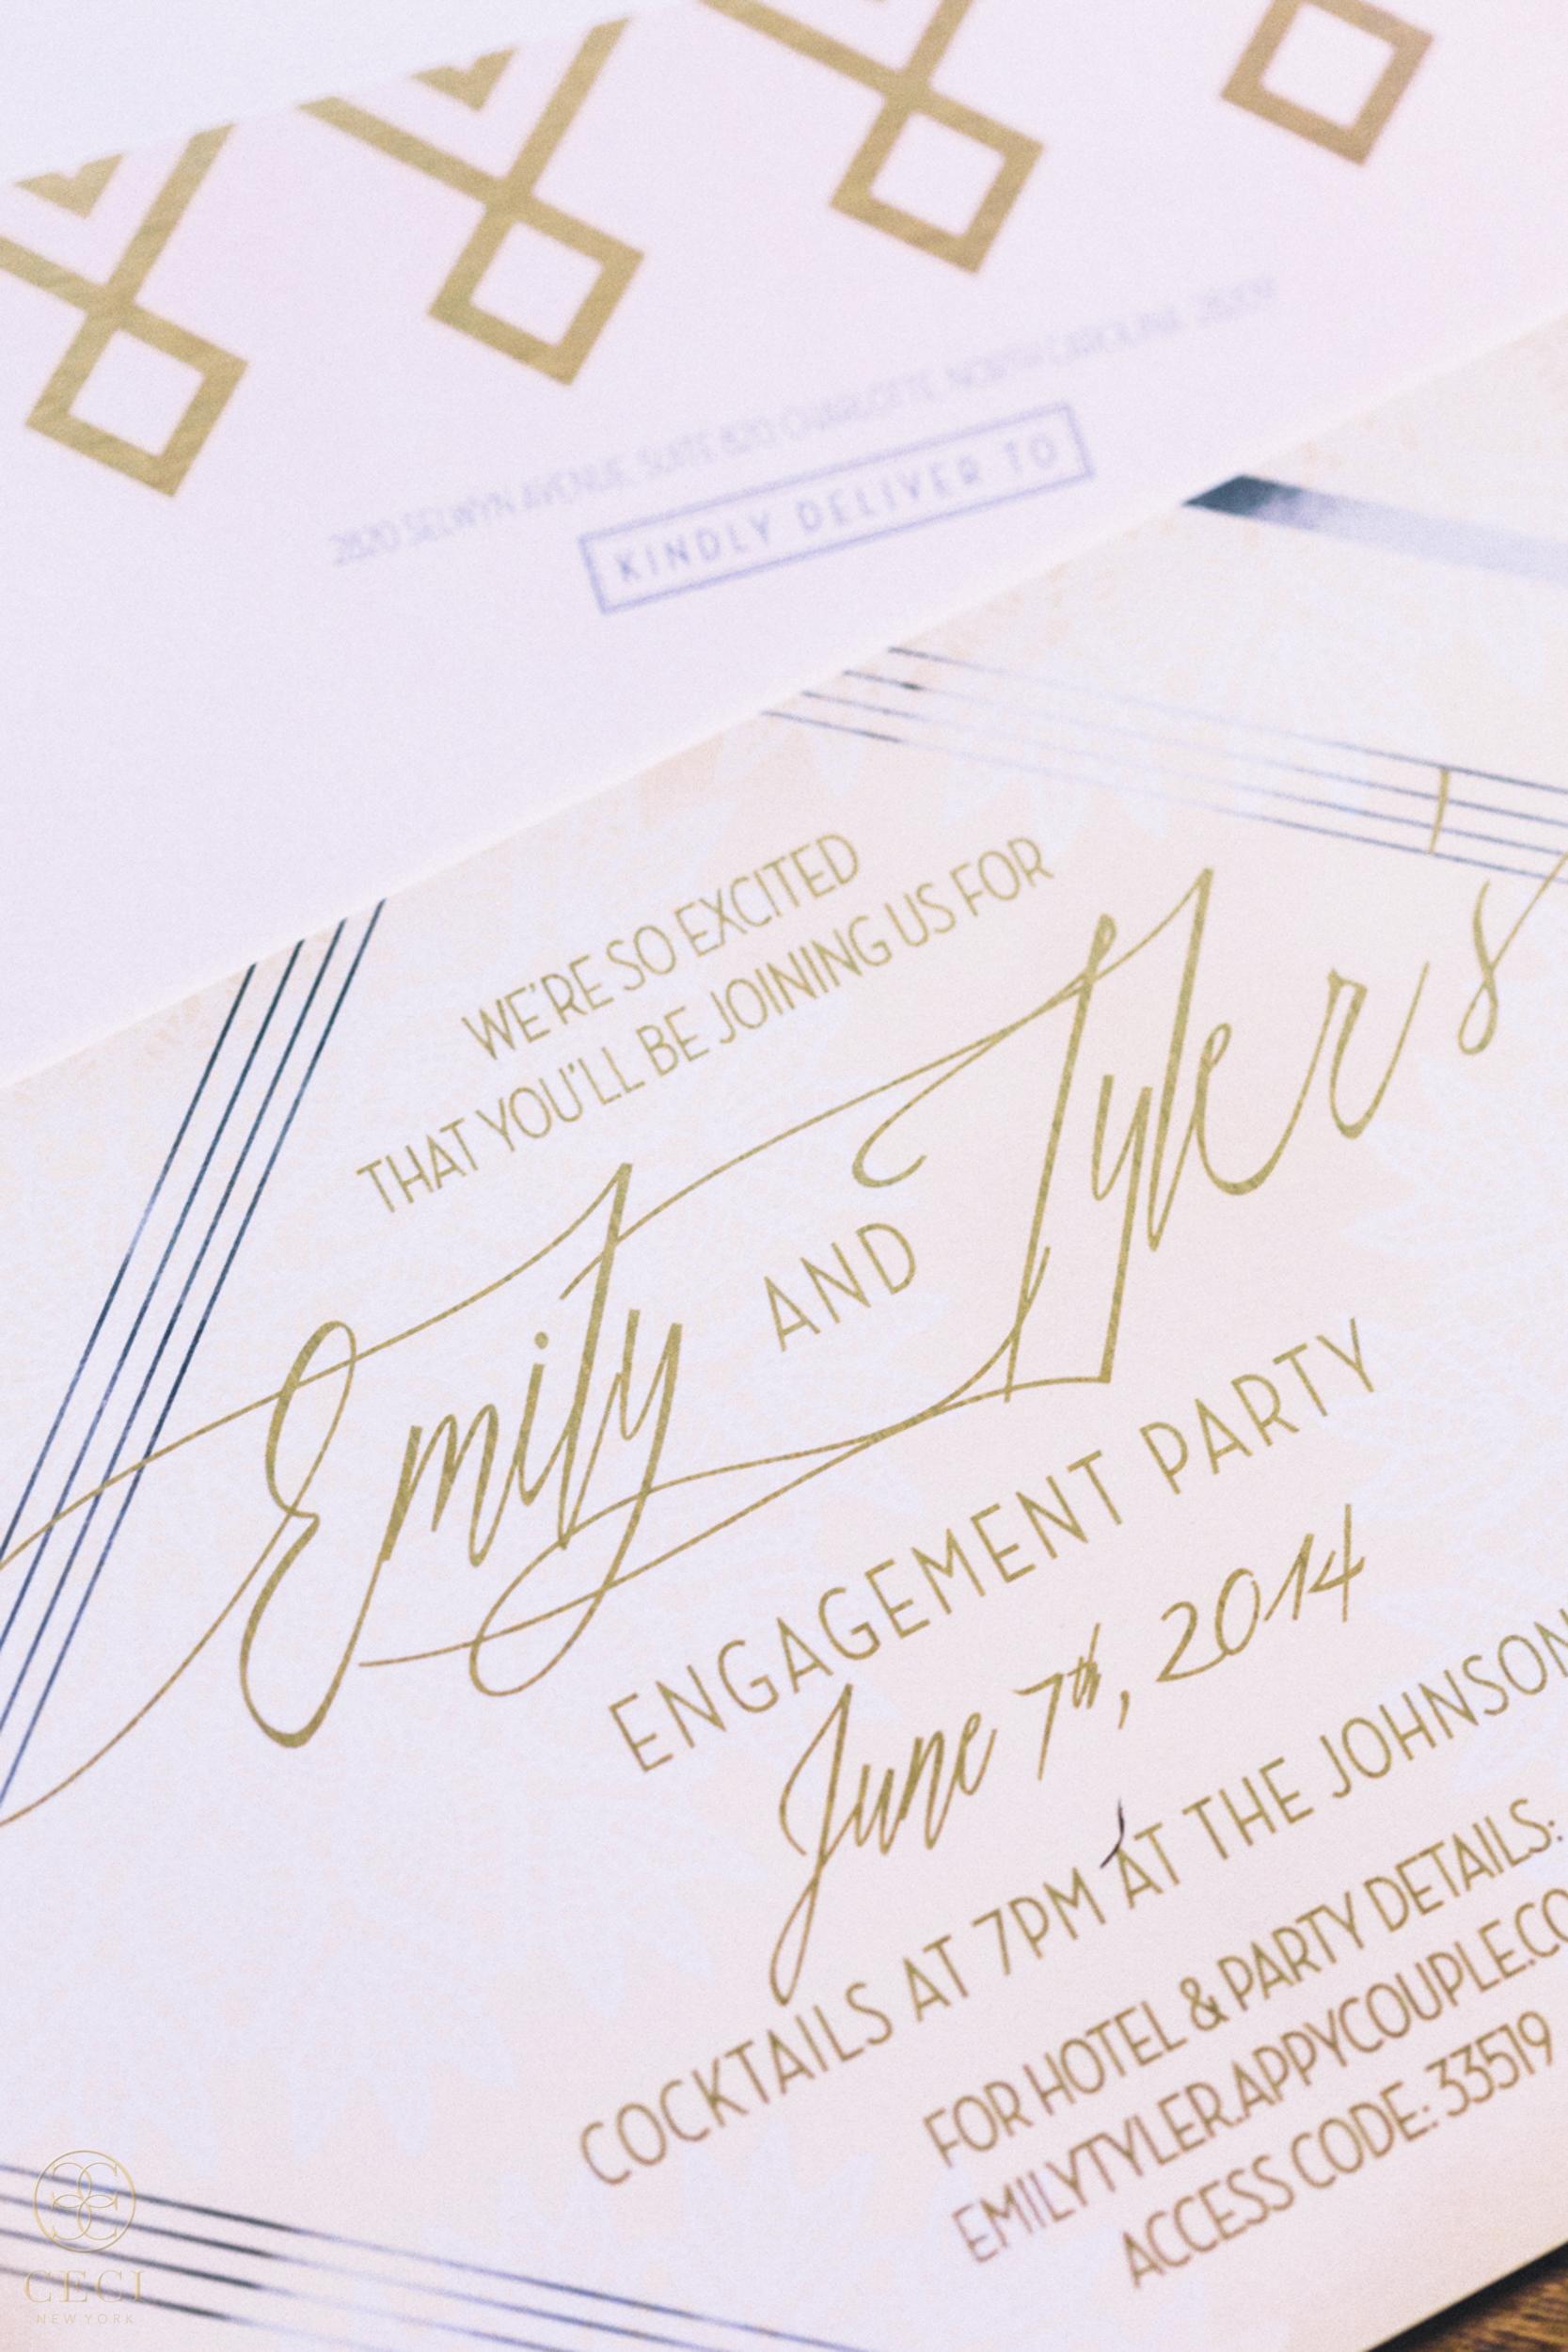 south_carolina_farm_wedding_rustic_chic_surprise_secret_luxe_wedding_bachelorette_emily_maynard_real_weddings_invitation_viewfinder_3D-1.jpg